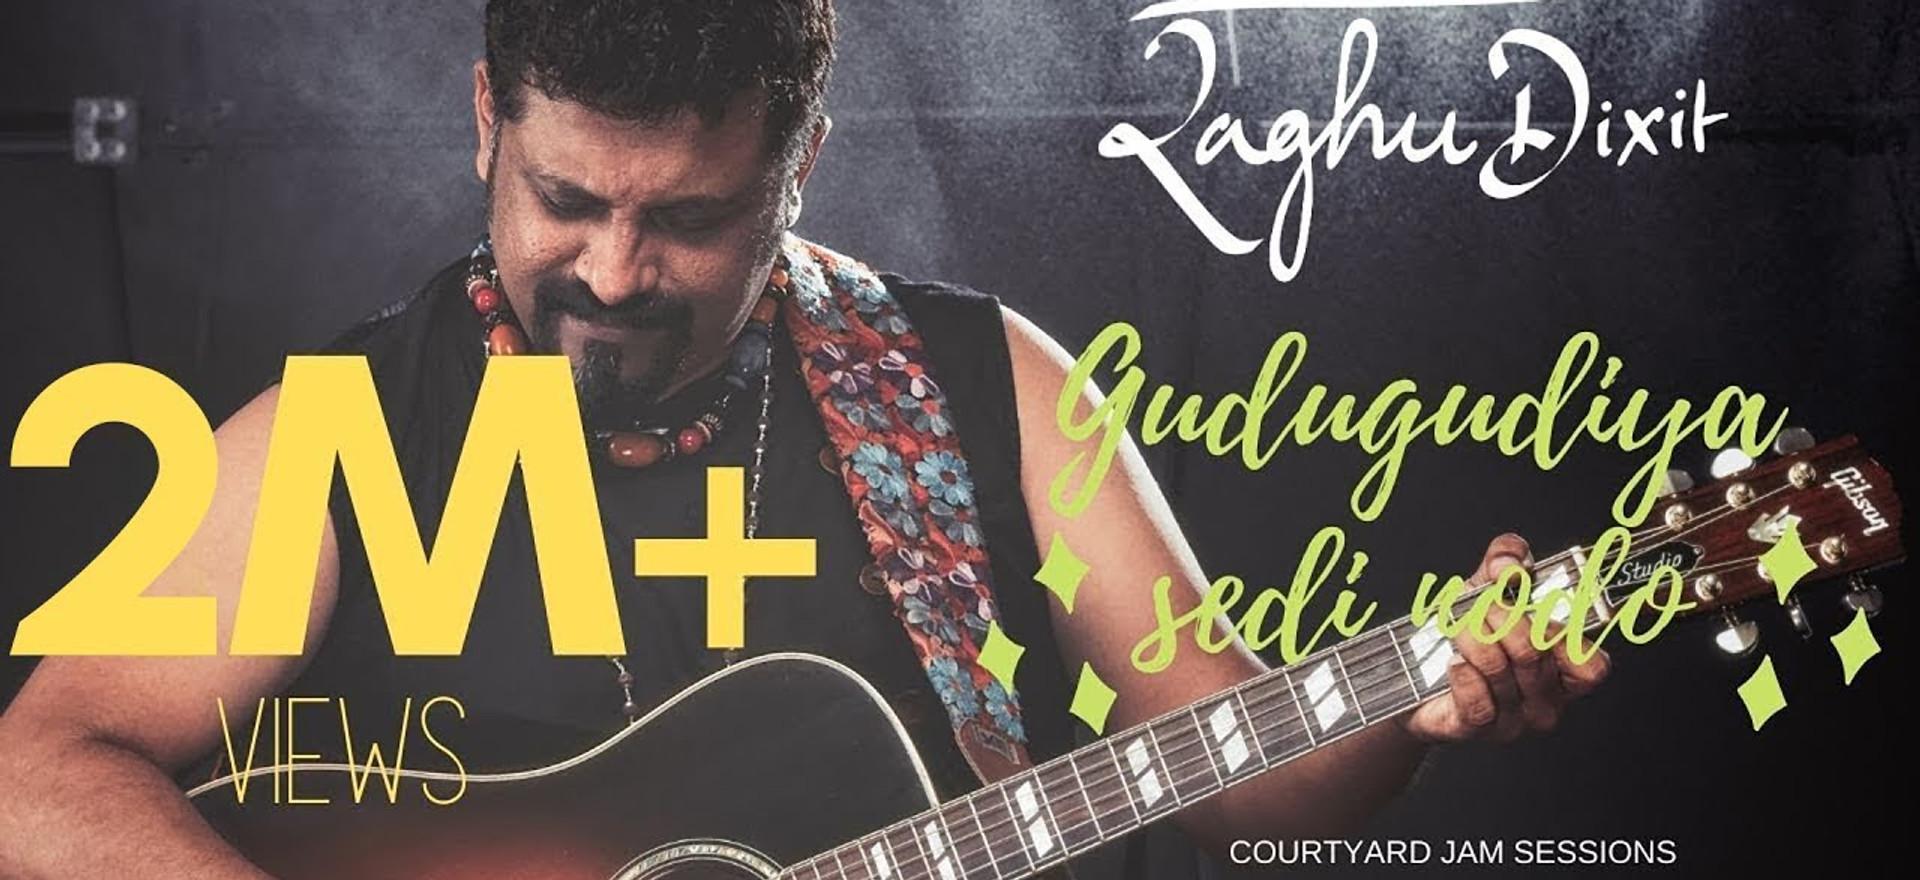 Gudugudiya Sedi Nodo | Raghu Dixit | Courtyard Jam Sessions